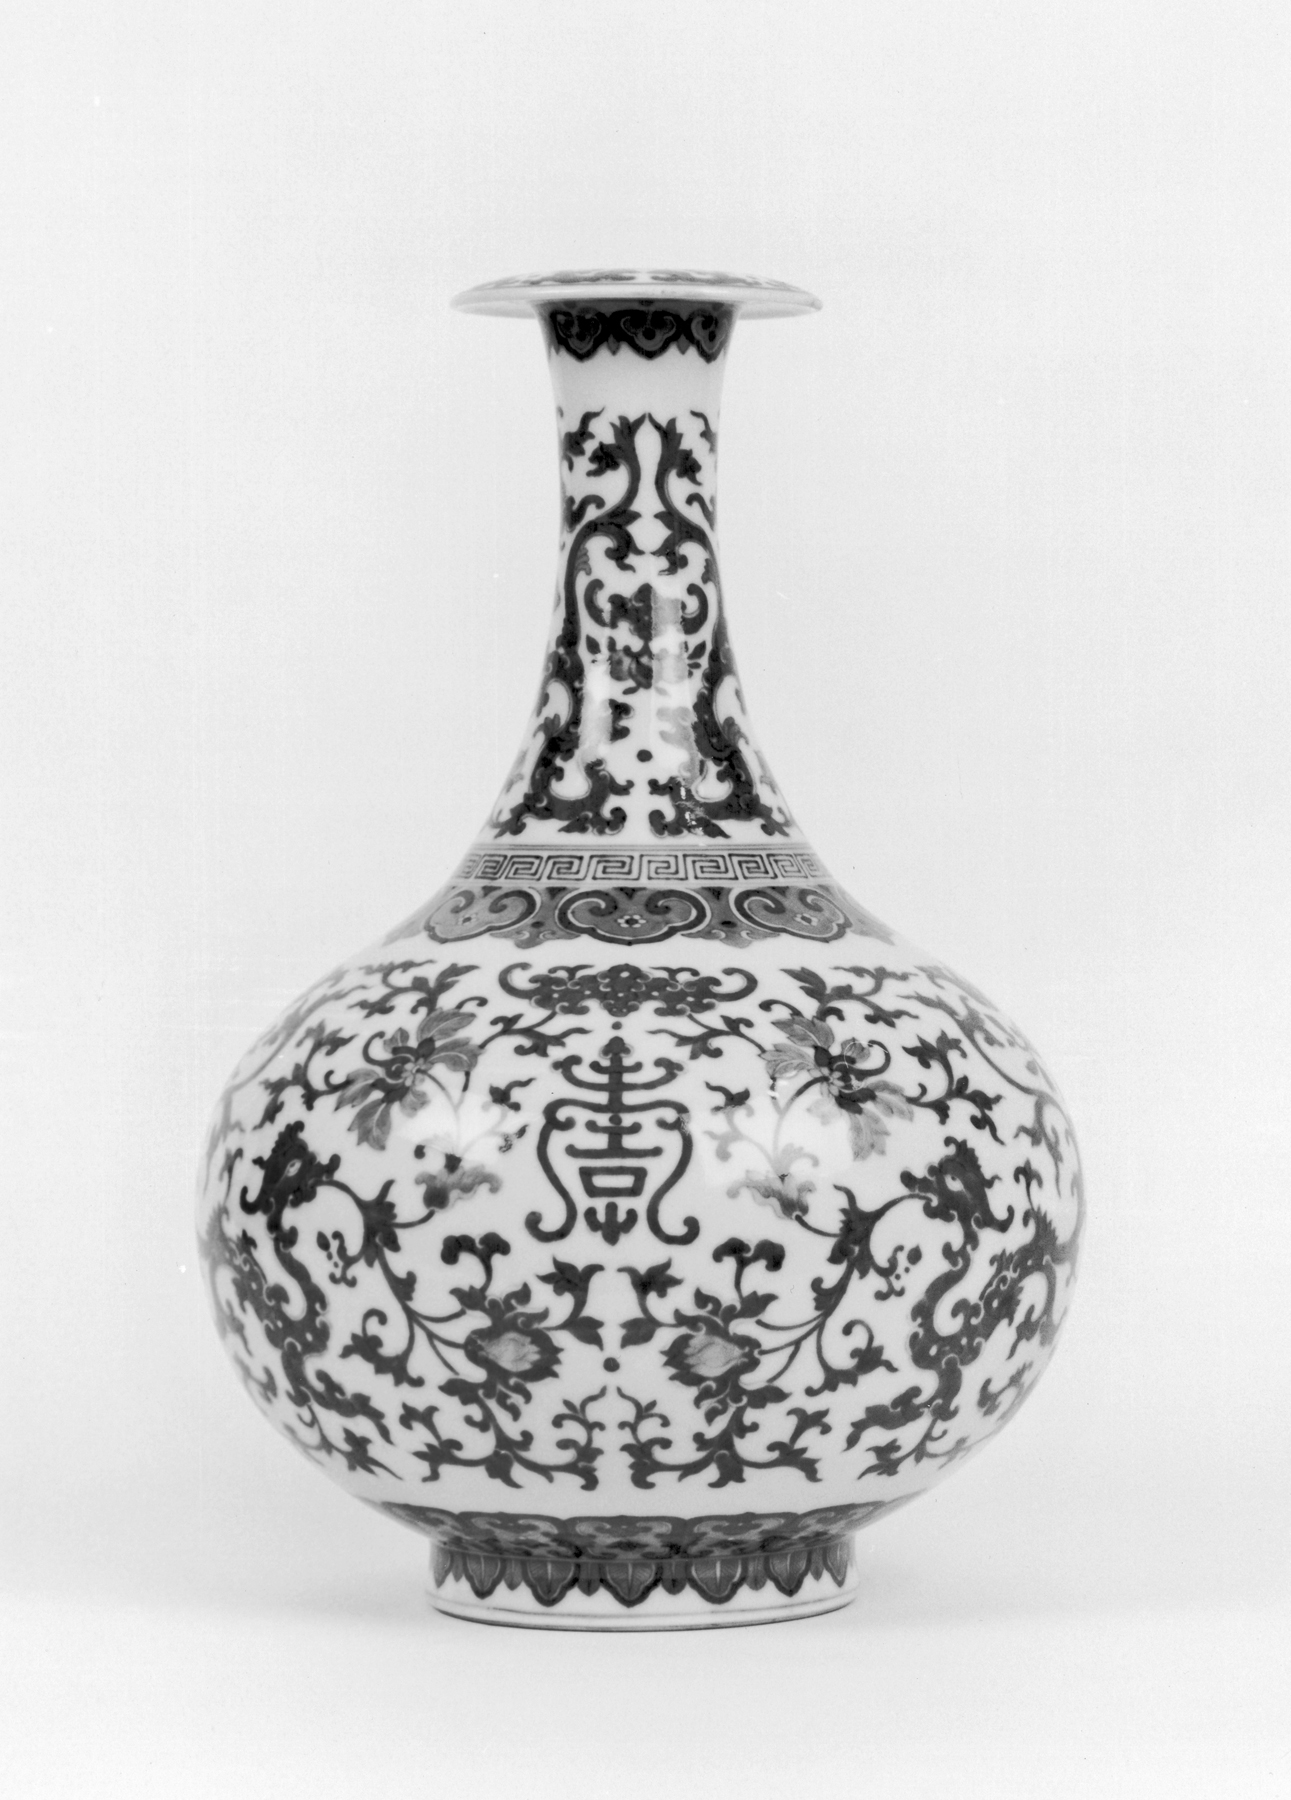 file chinese bottle vase with floral designs walters. Black Bedroom Furniture Sets. Home Design Ideas